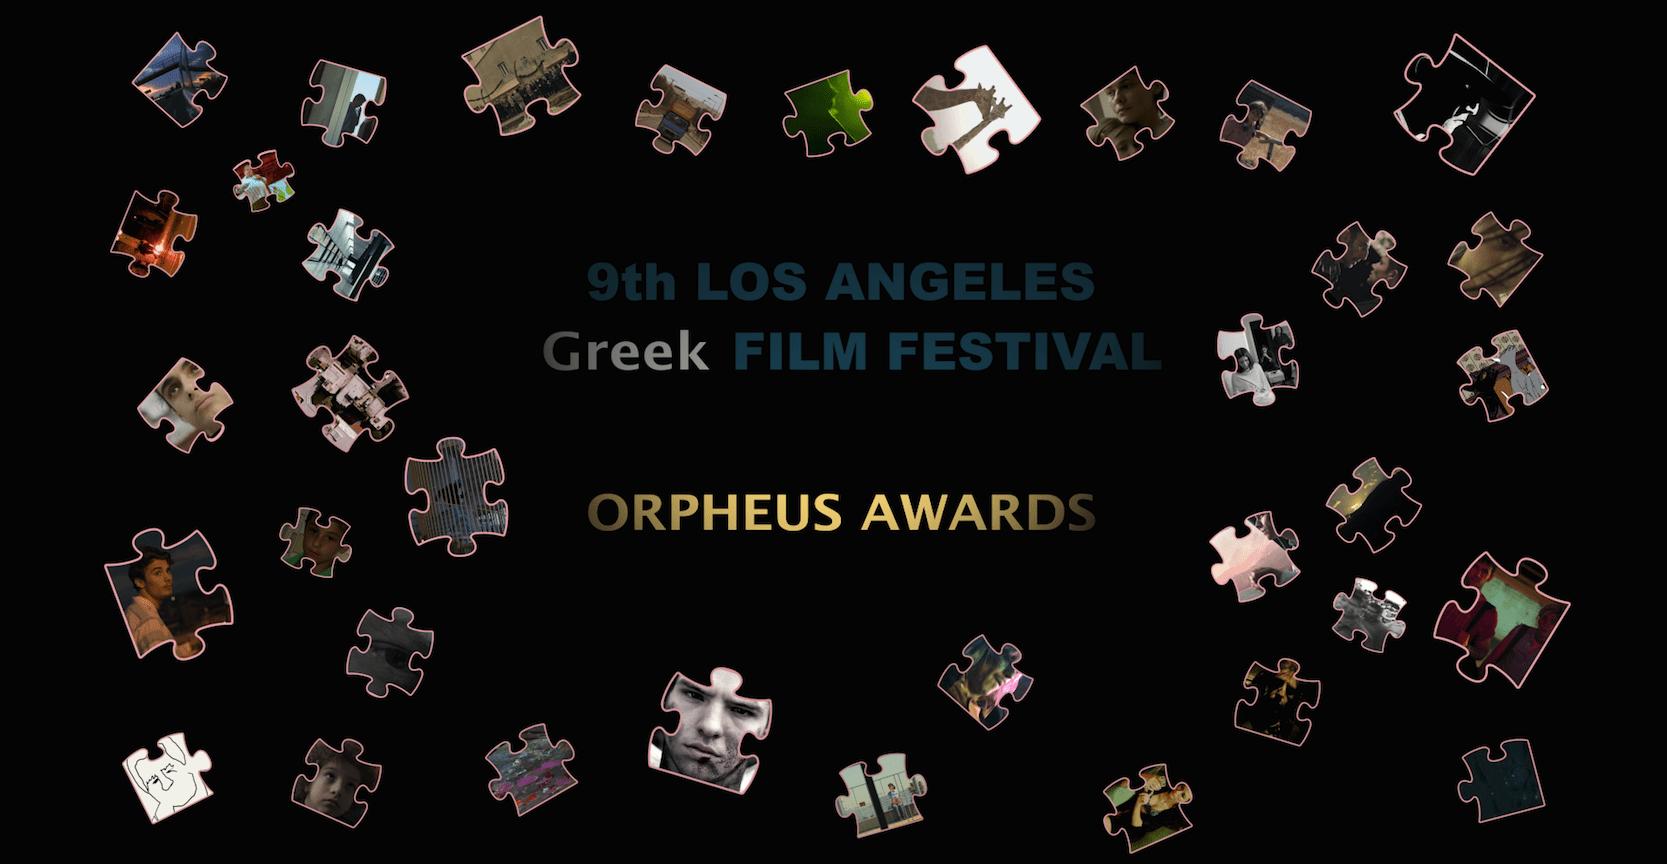 Orpheus Awards 2015